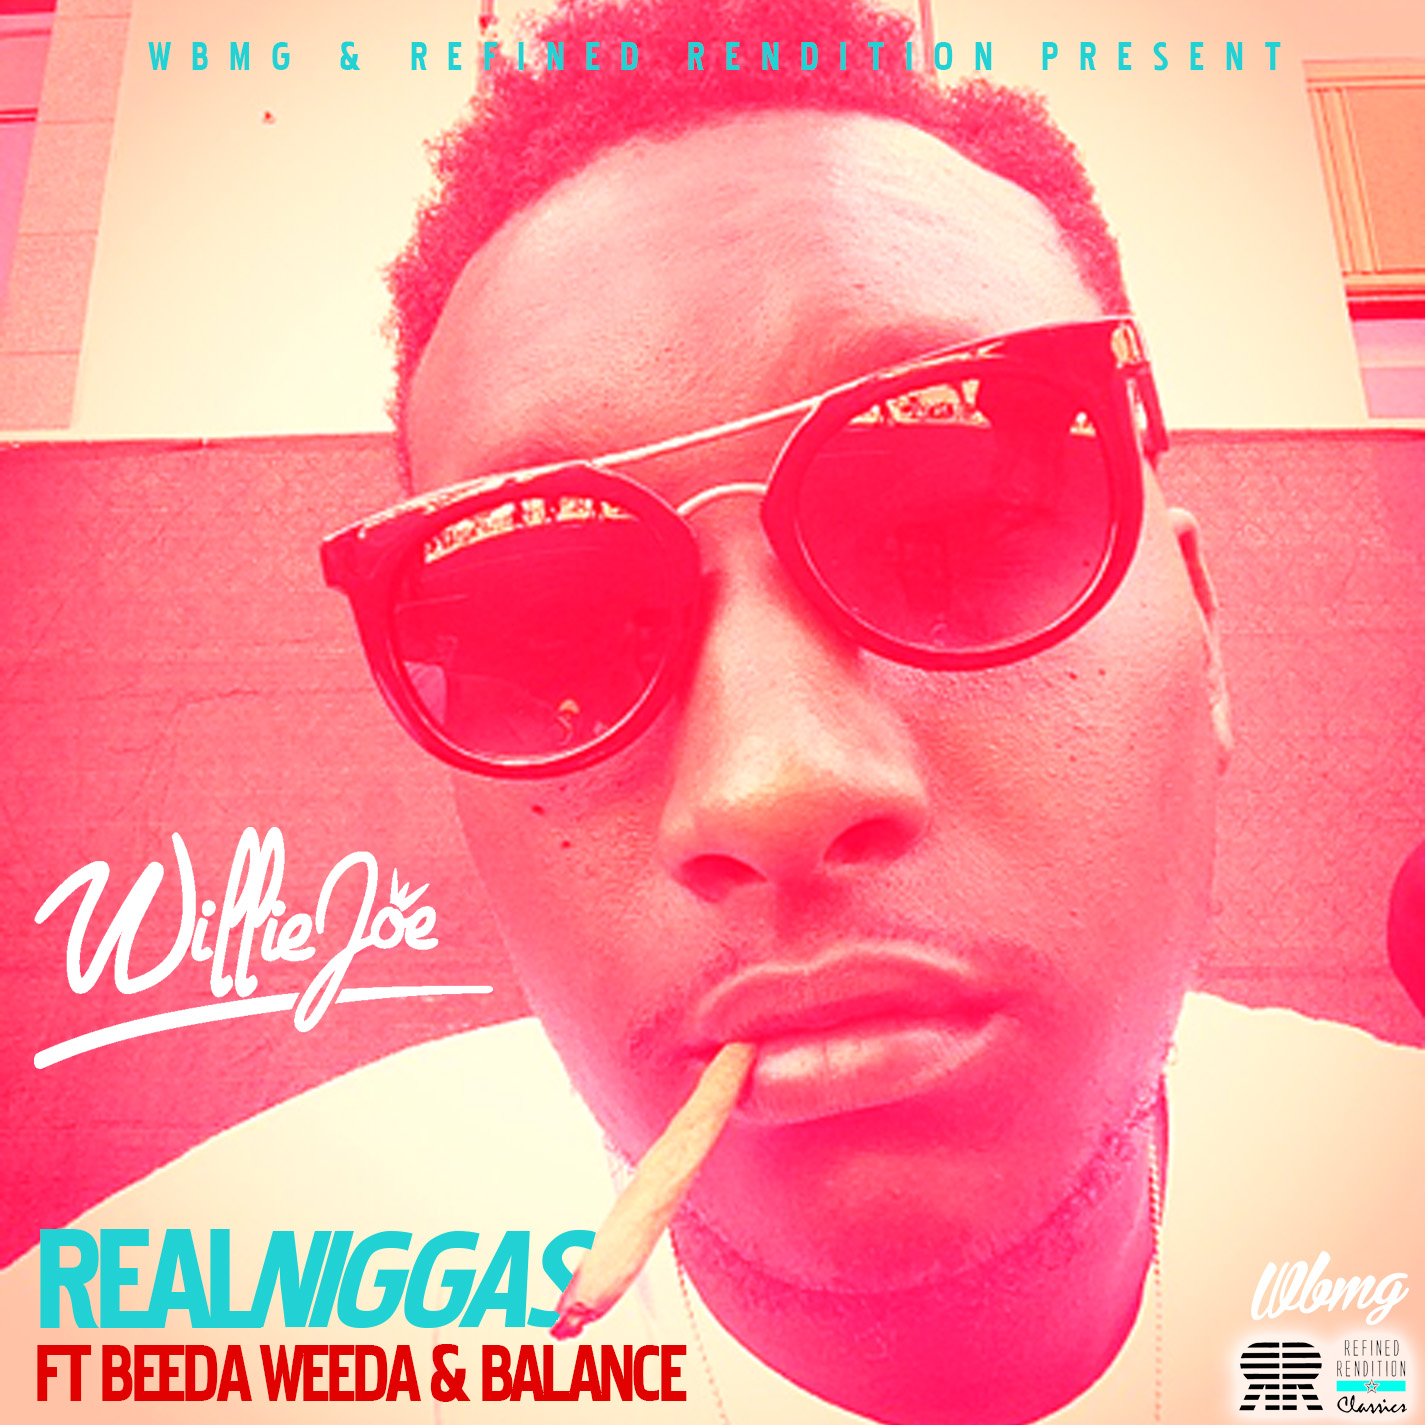 Willie Joe ft. Beeda Weeda & Balance - Real Niggas [Thizzler.com Exclusive]